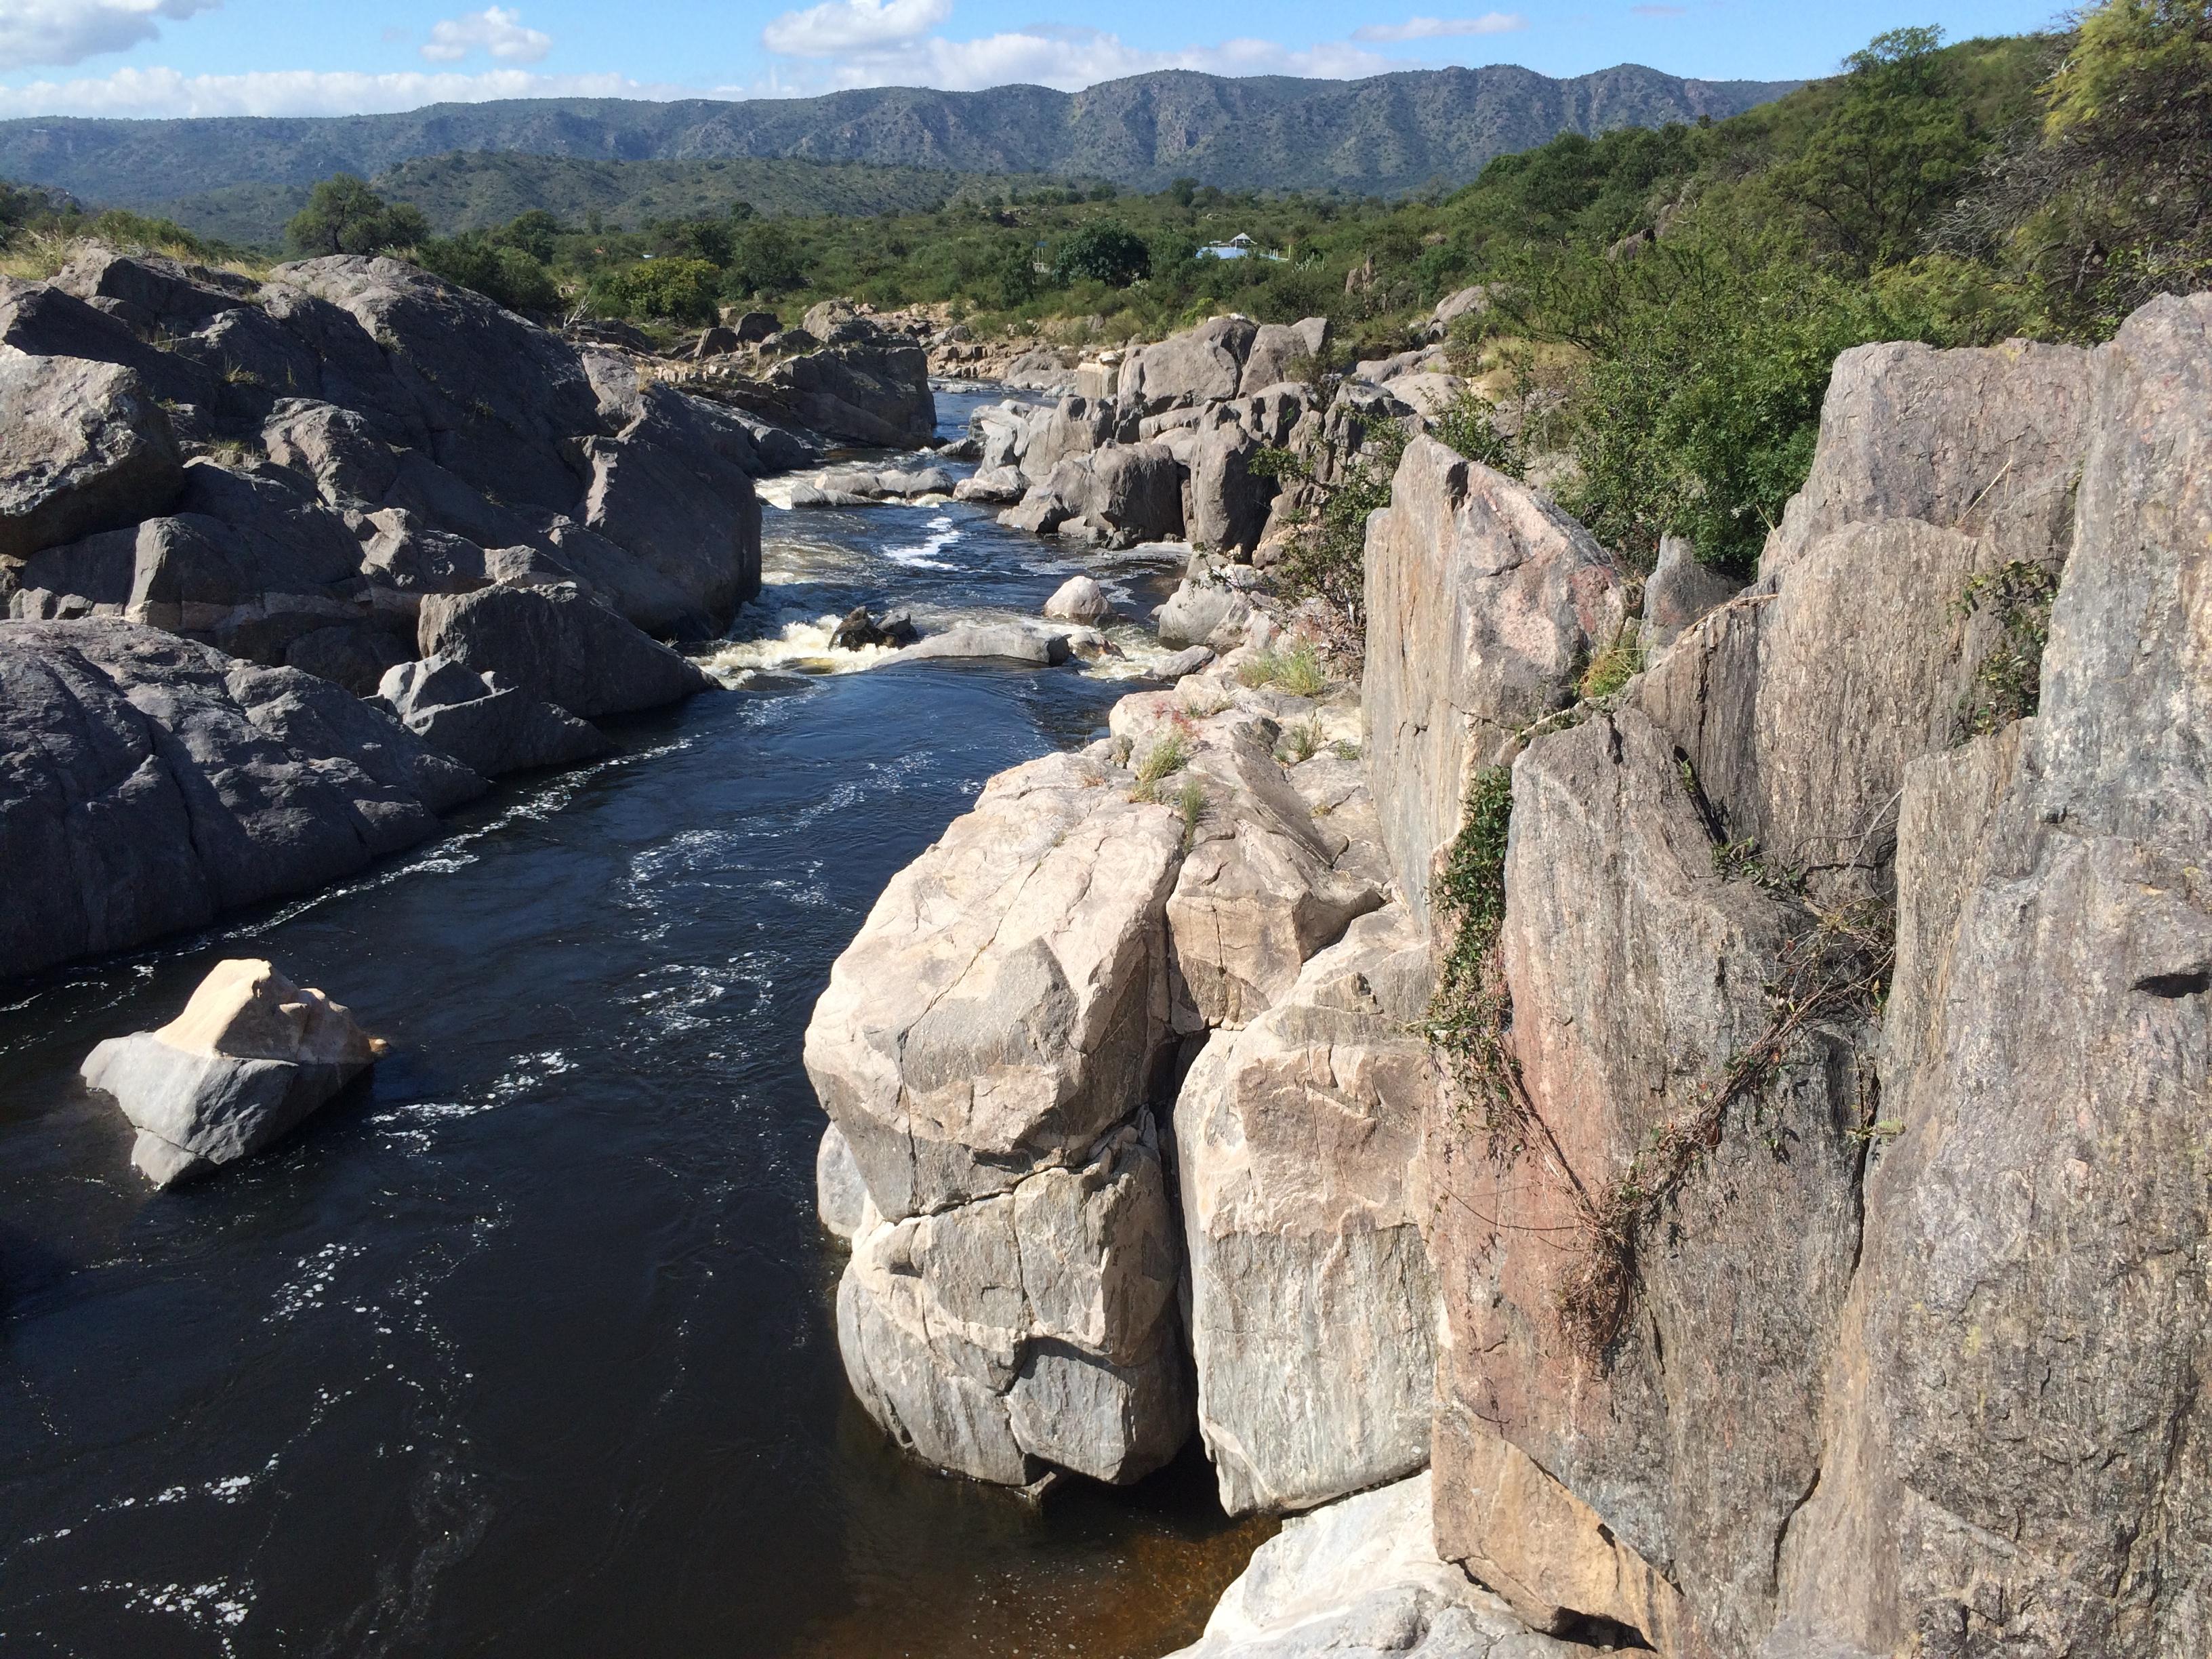 Las Tres Piletas. San Marcos Sierras